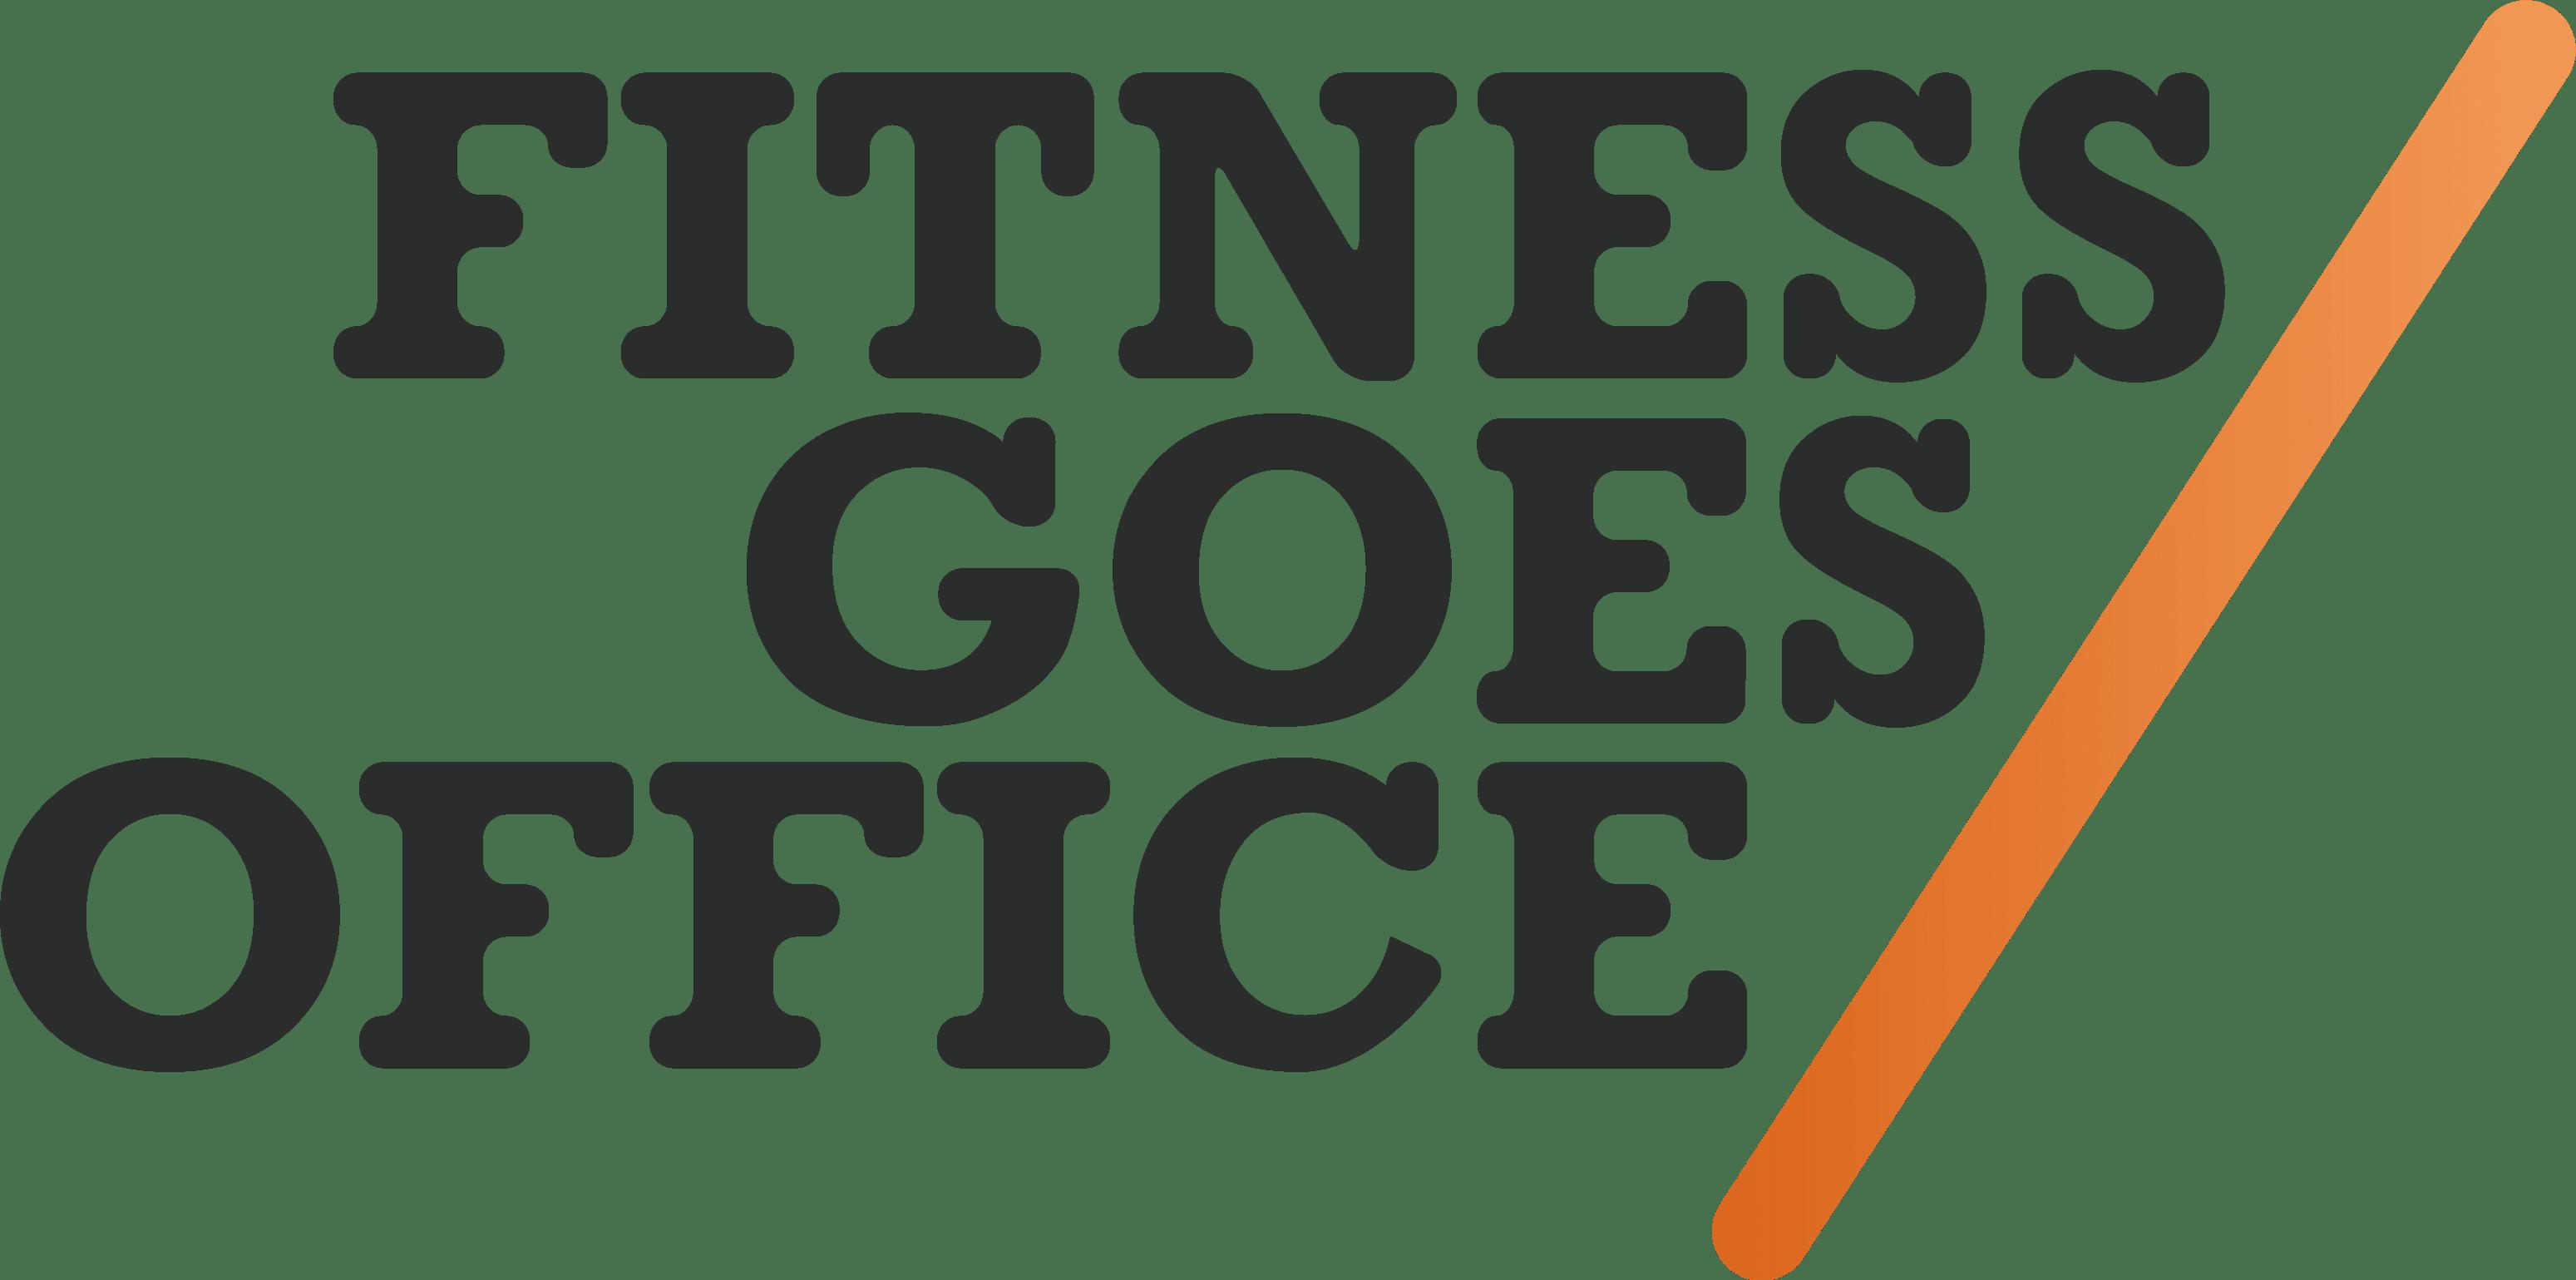 FitnessGoesOffice Logo Gradient